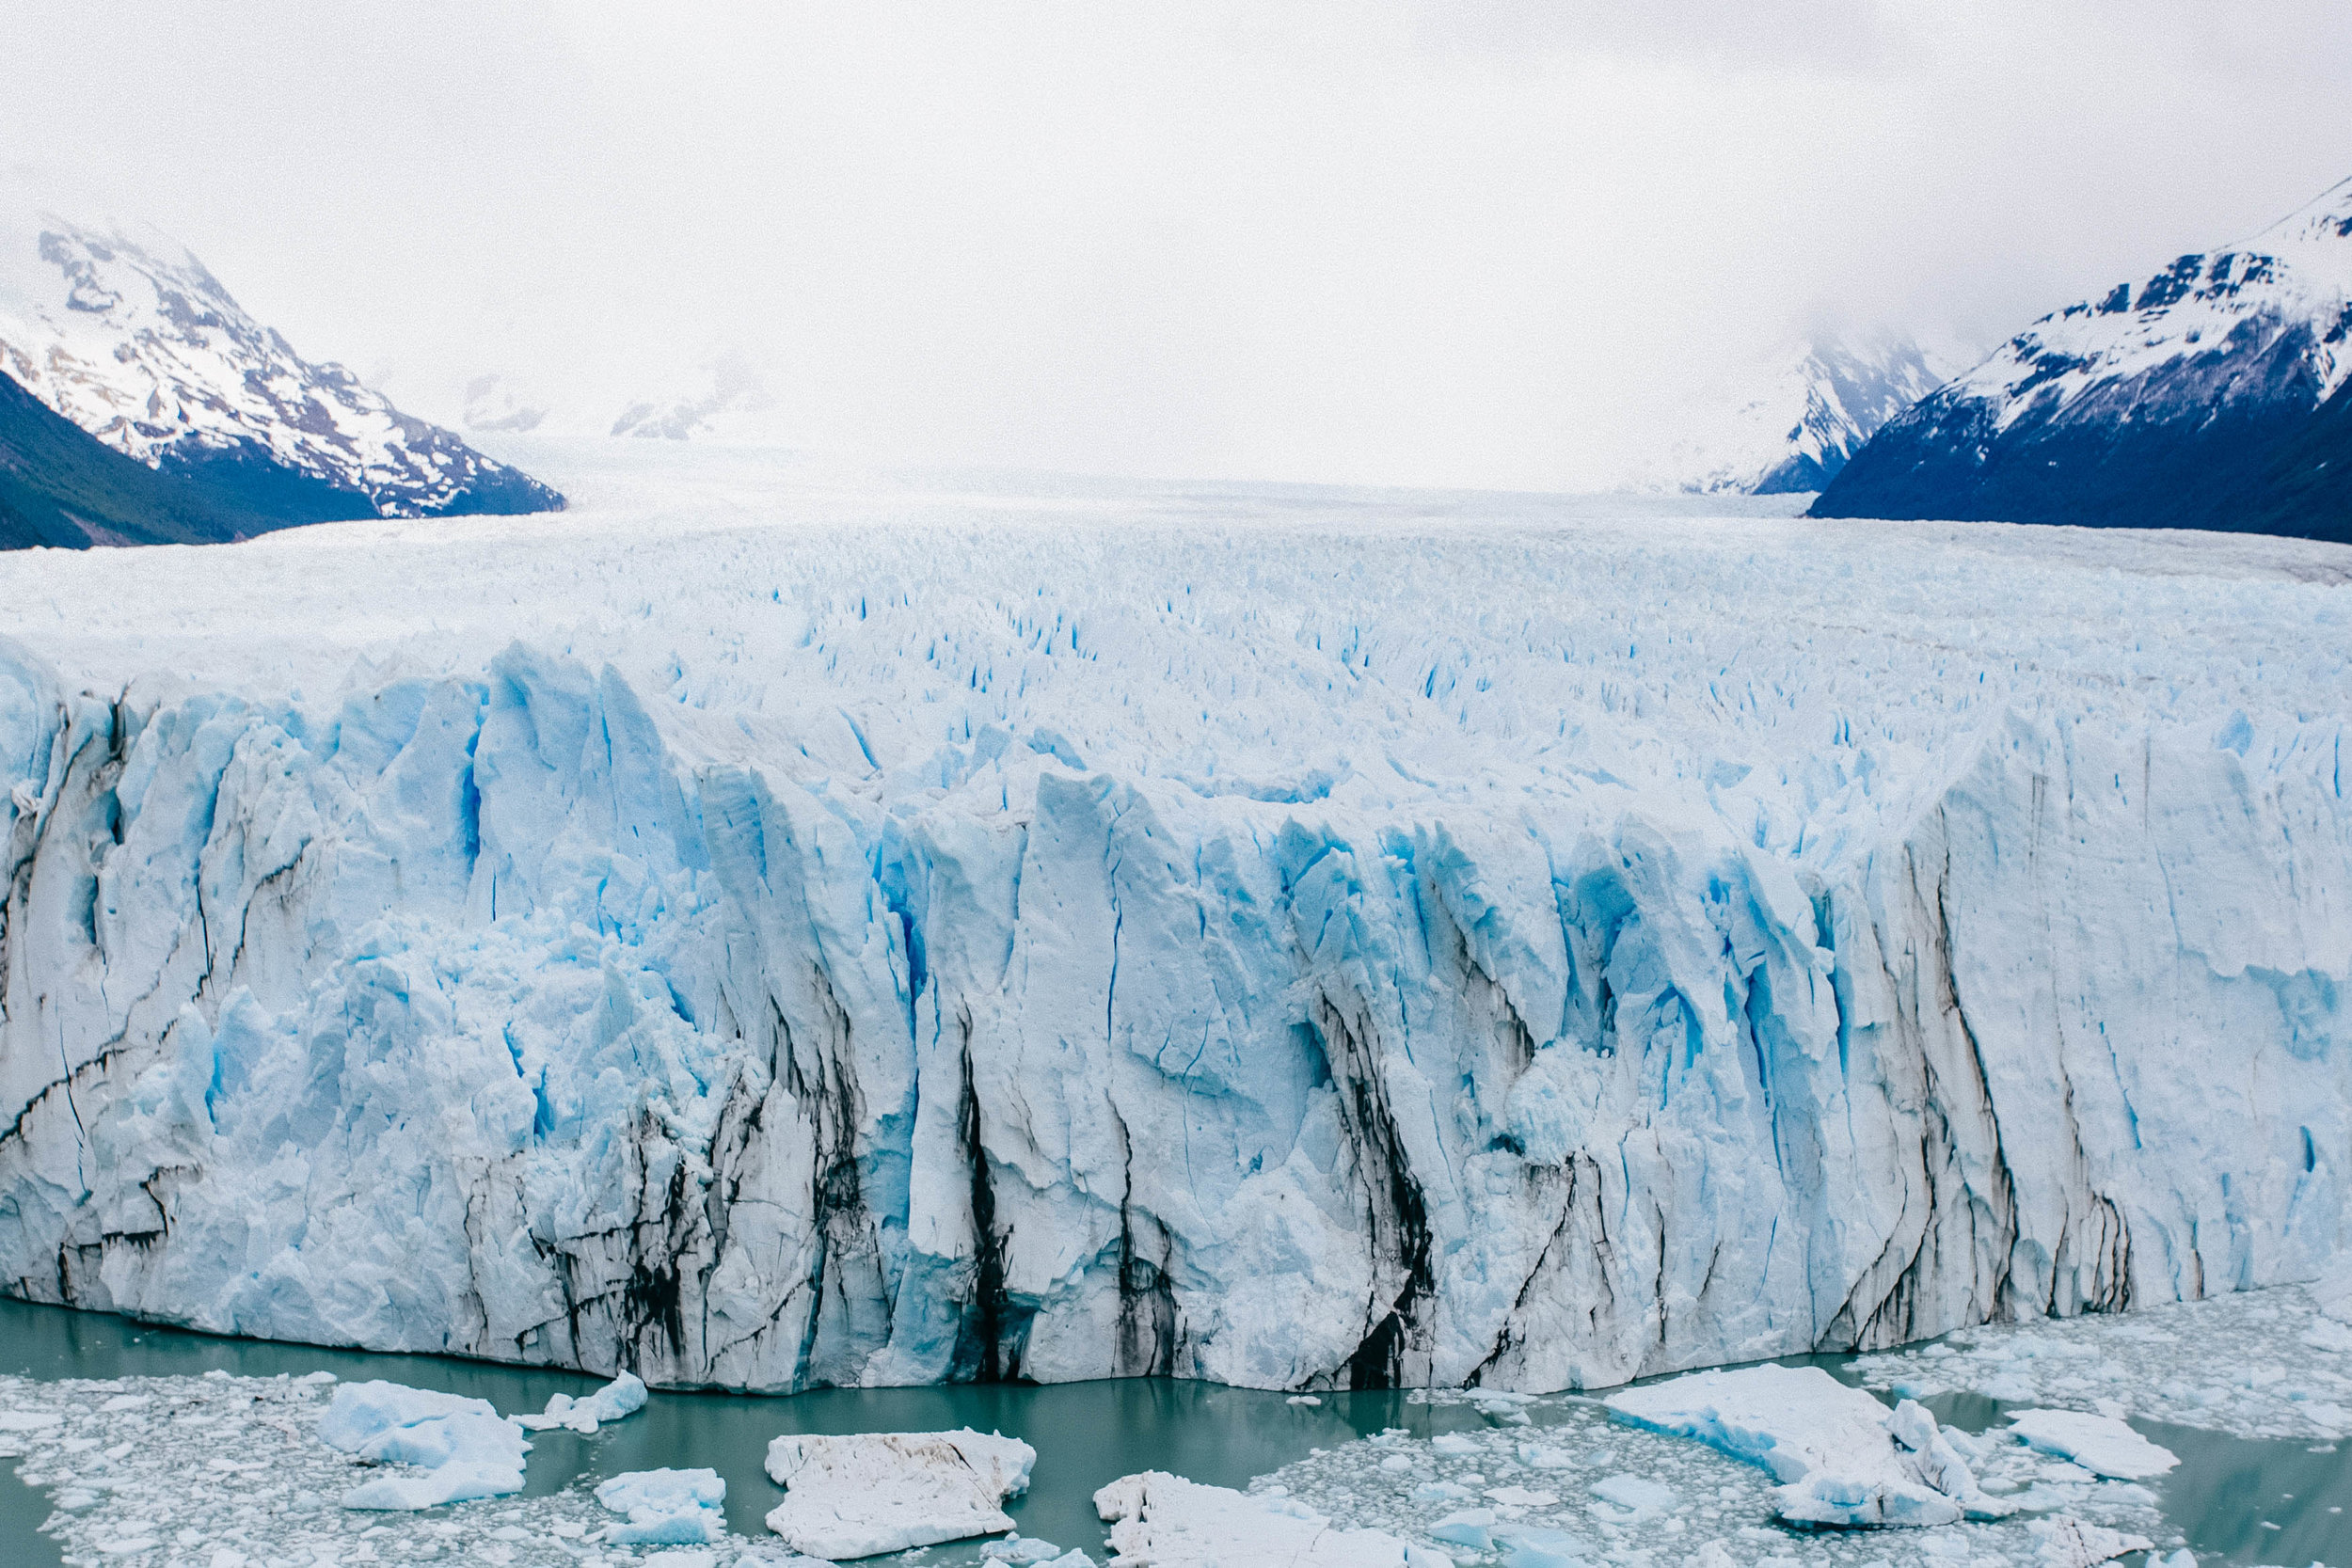 perito moreno patagonia argentina 15.jpg